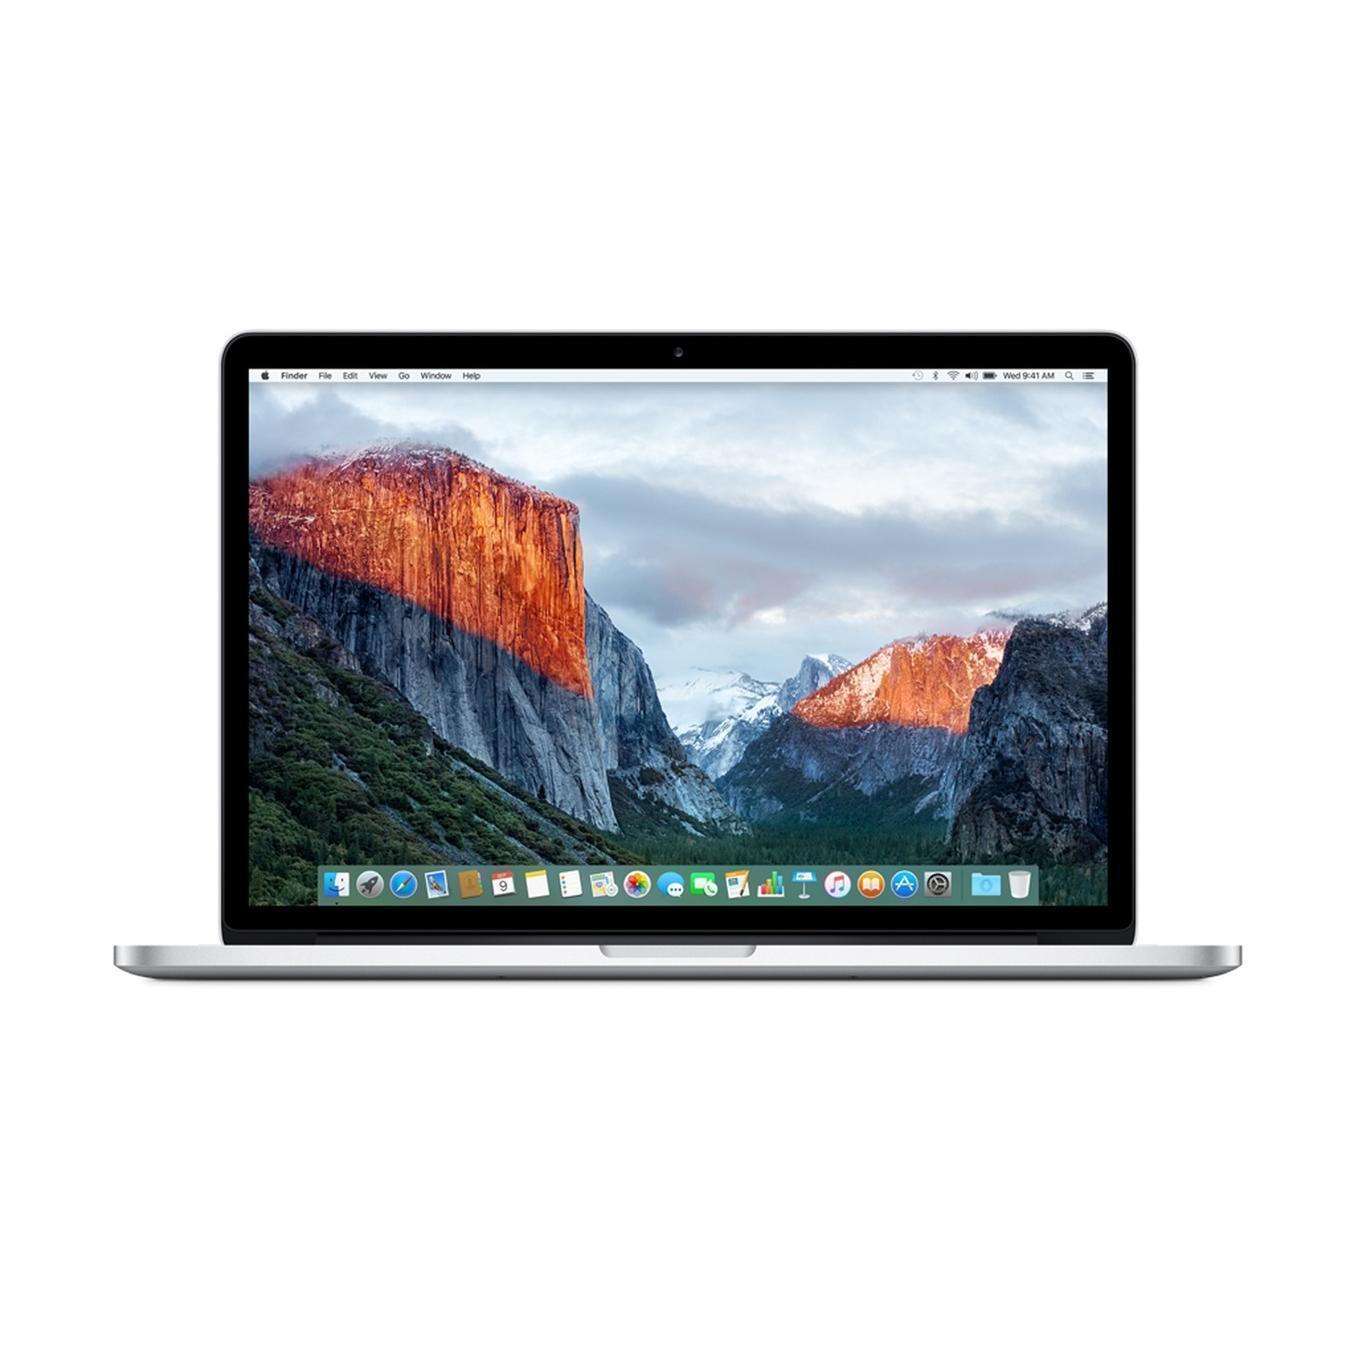 MacBook Pro Retina 15,4-tum (2012) - Core i7 - 16GB - SSD 256 GB Qwerty - Norska